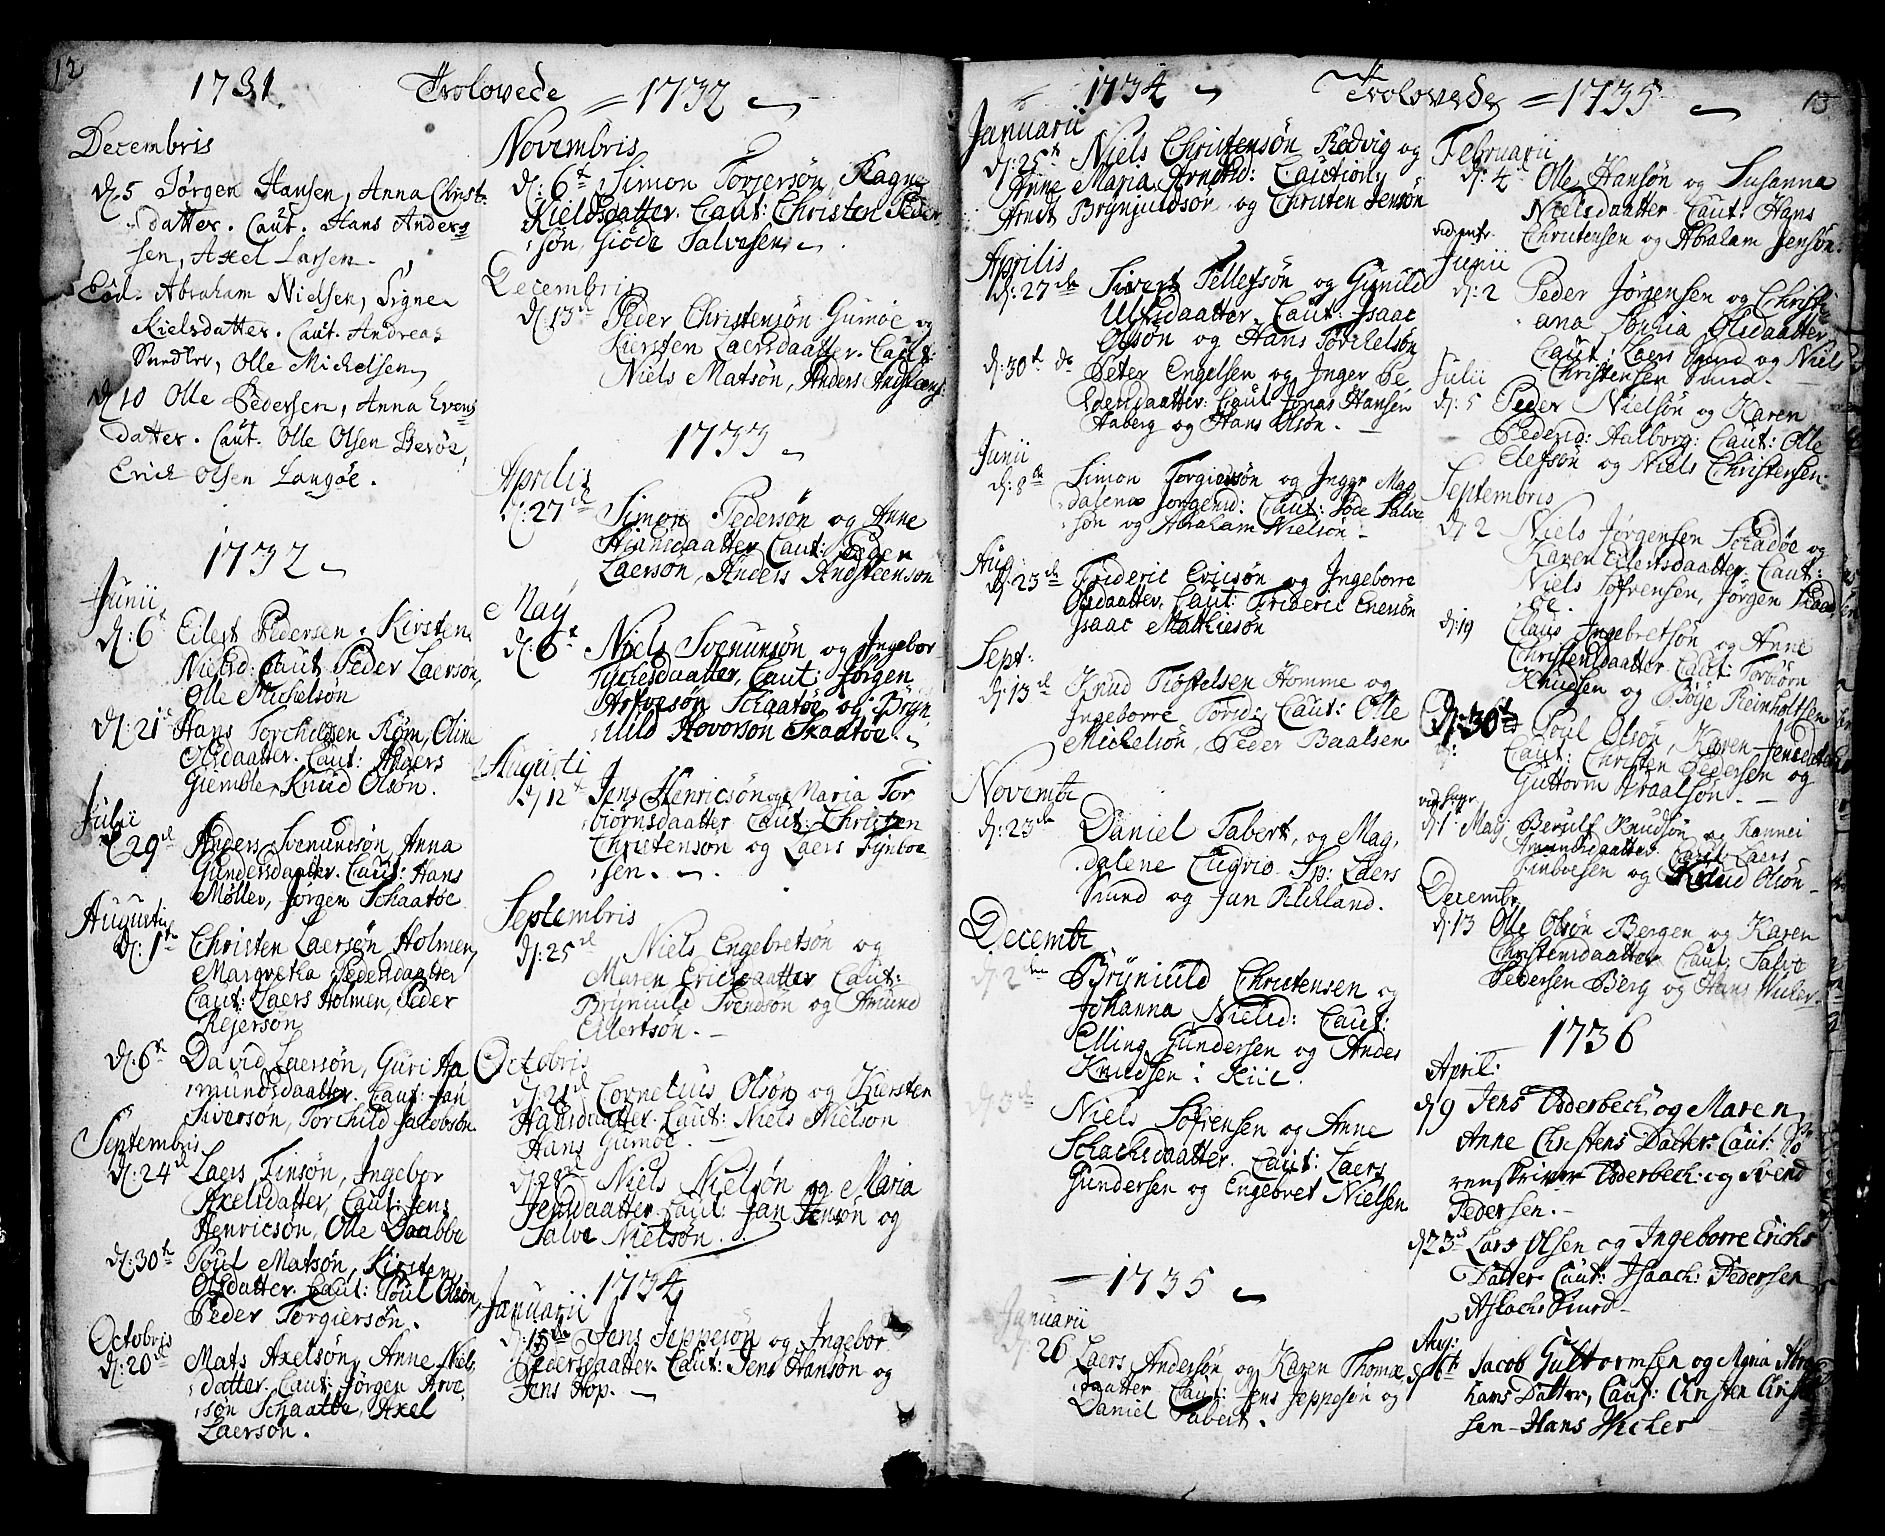 SAKO, Kragerø kirkebøker, F/Fa/L0001: Ministerialbok nr. 1, 1702-1766, s. 12-13